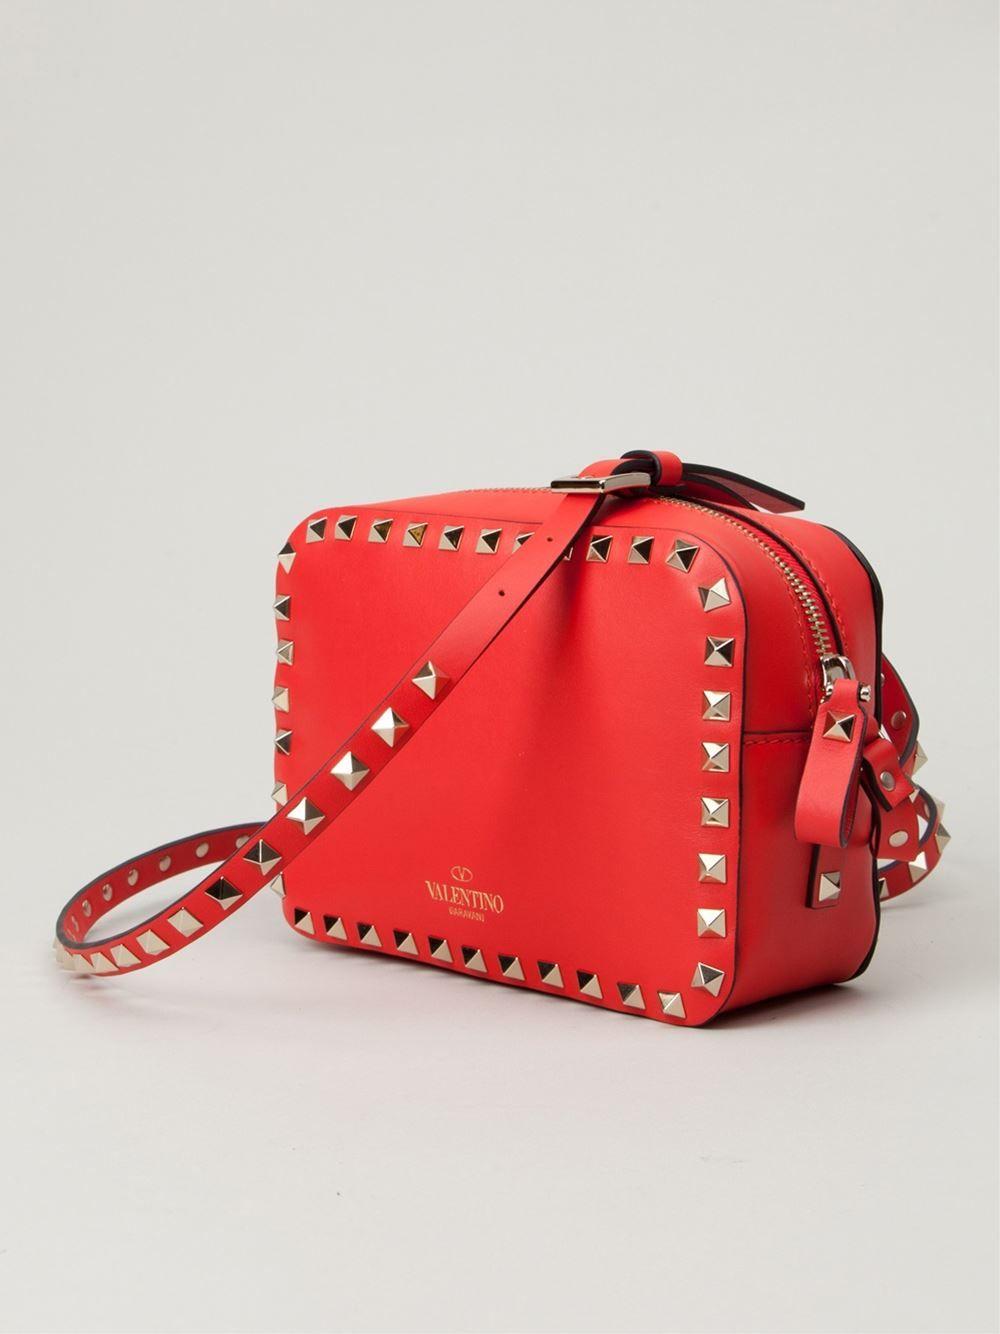 Red Rockstud cross-body bag Valentino sf00C